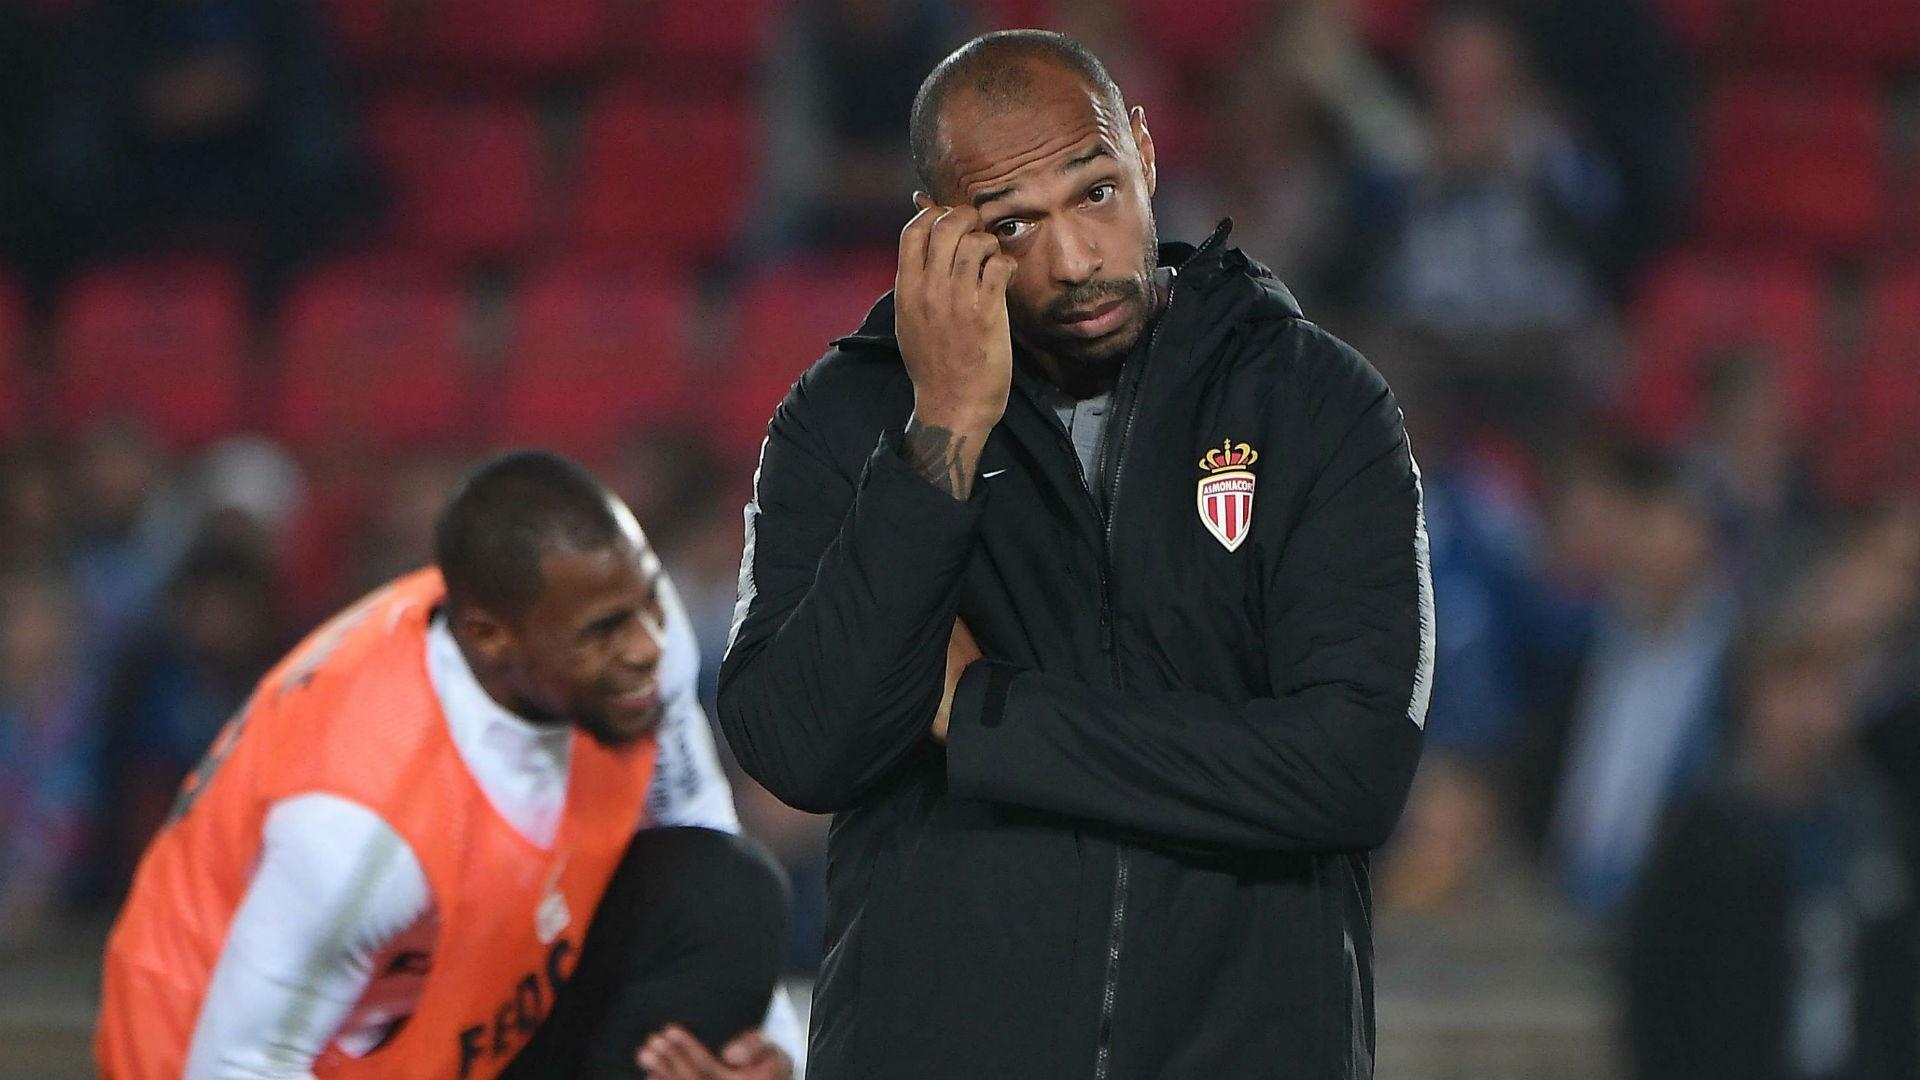 Thierry Henry Akan Senang Jika Mbappe Ada di AS Monaco